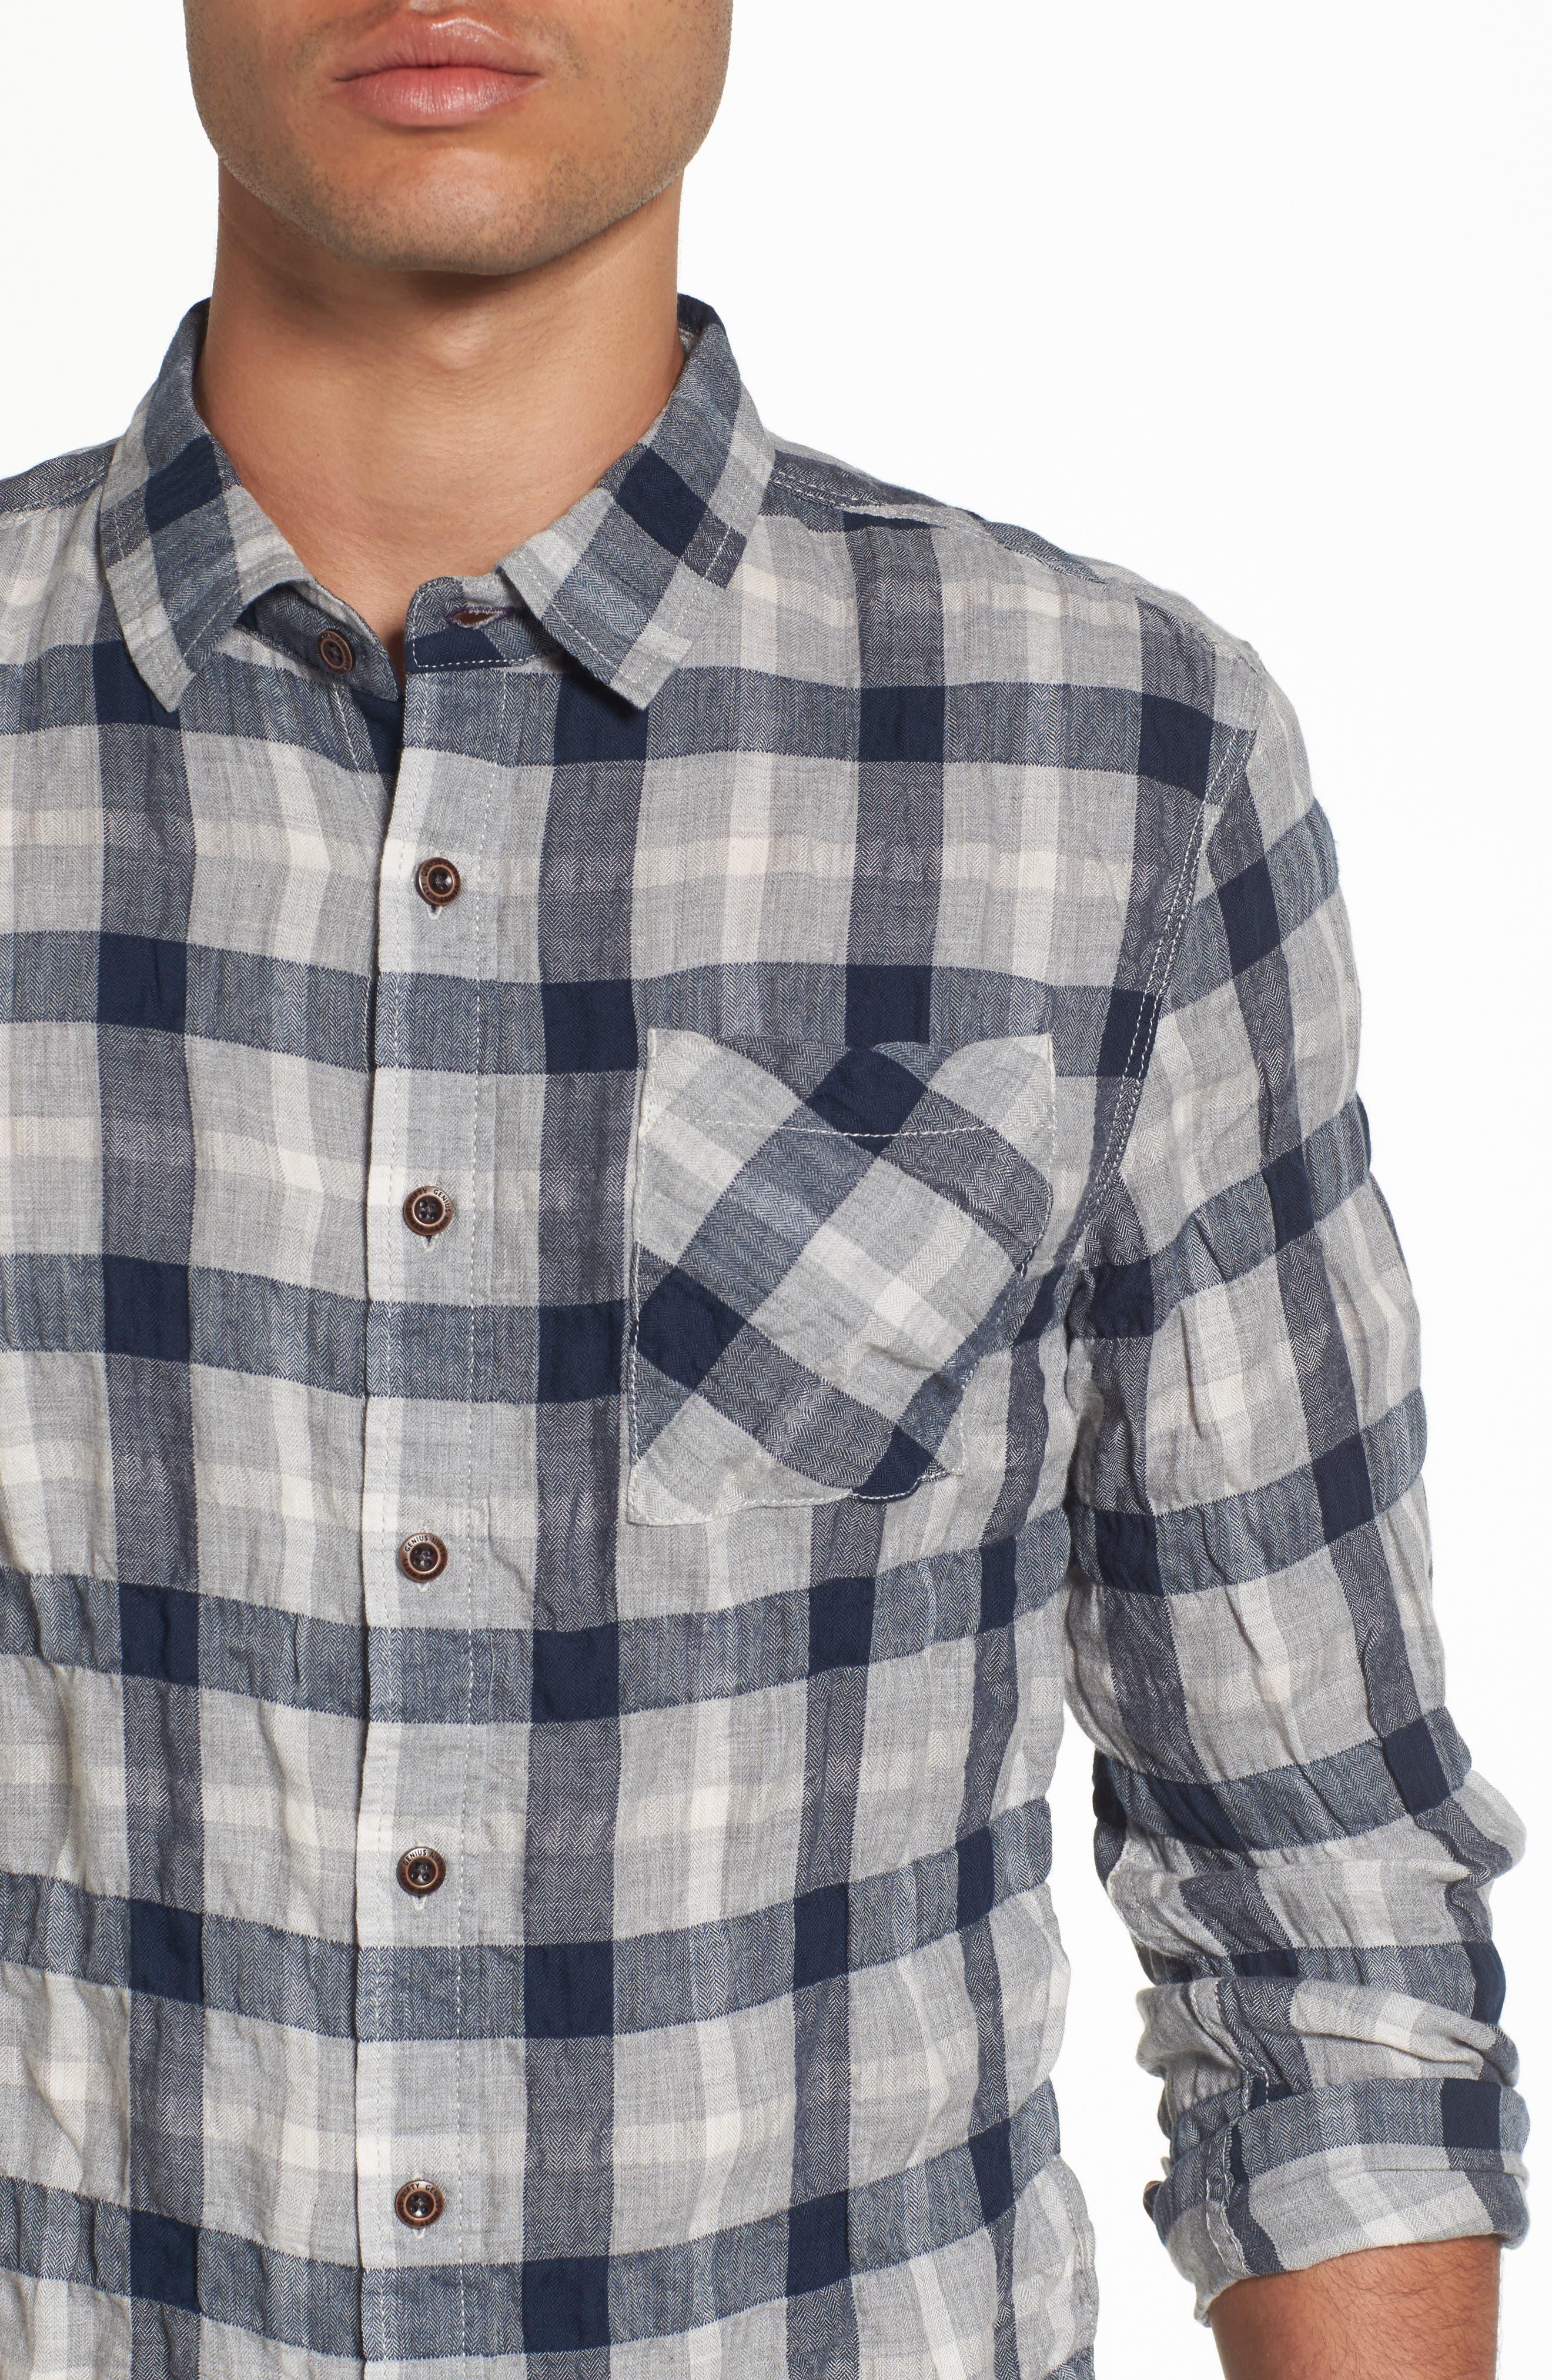 Truman Plaid Sport Shirt,                             Alternate thumbnail 4, color,                             Gray/ Navy/ White